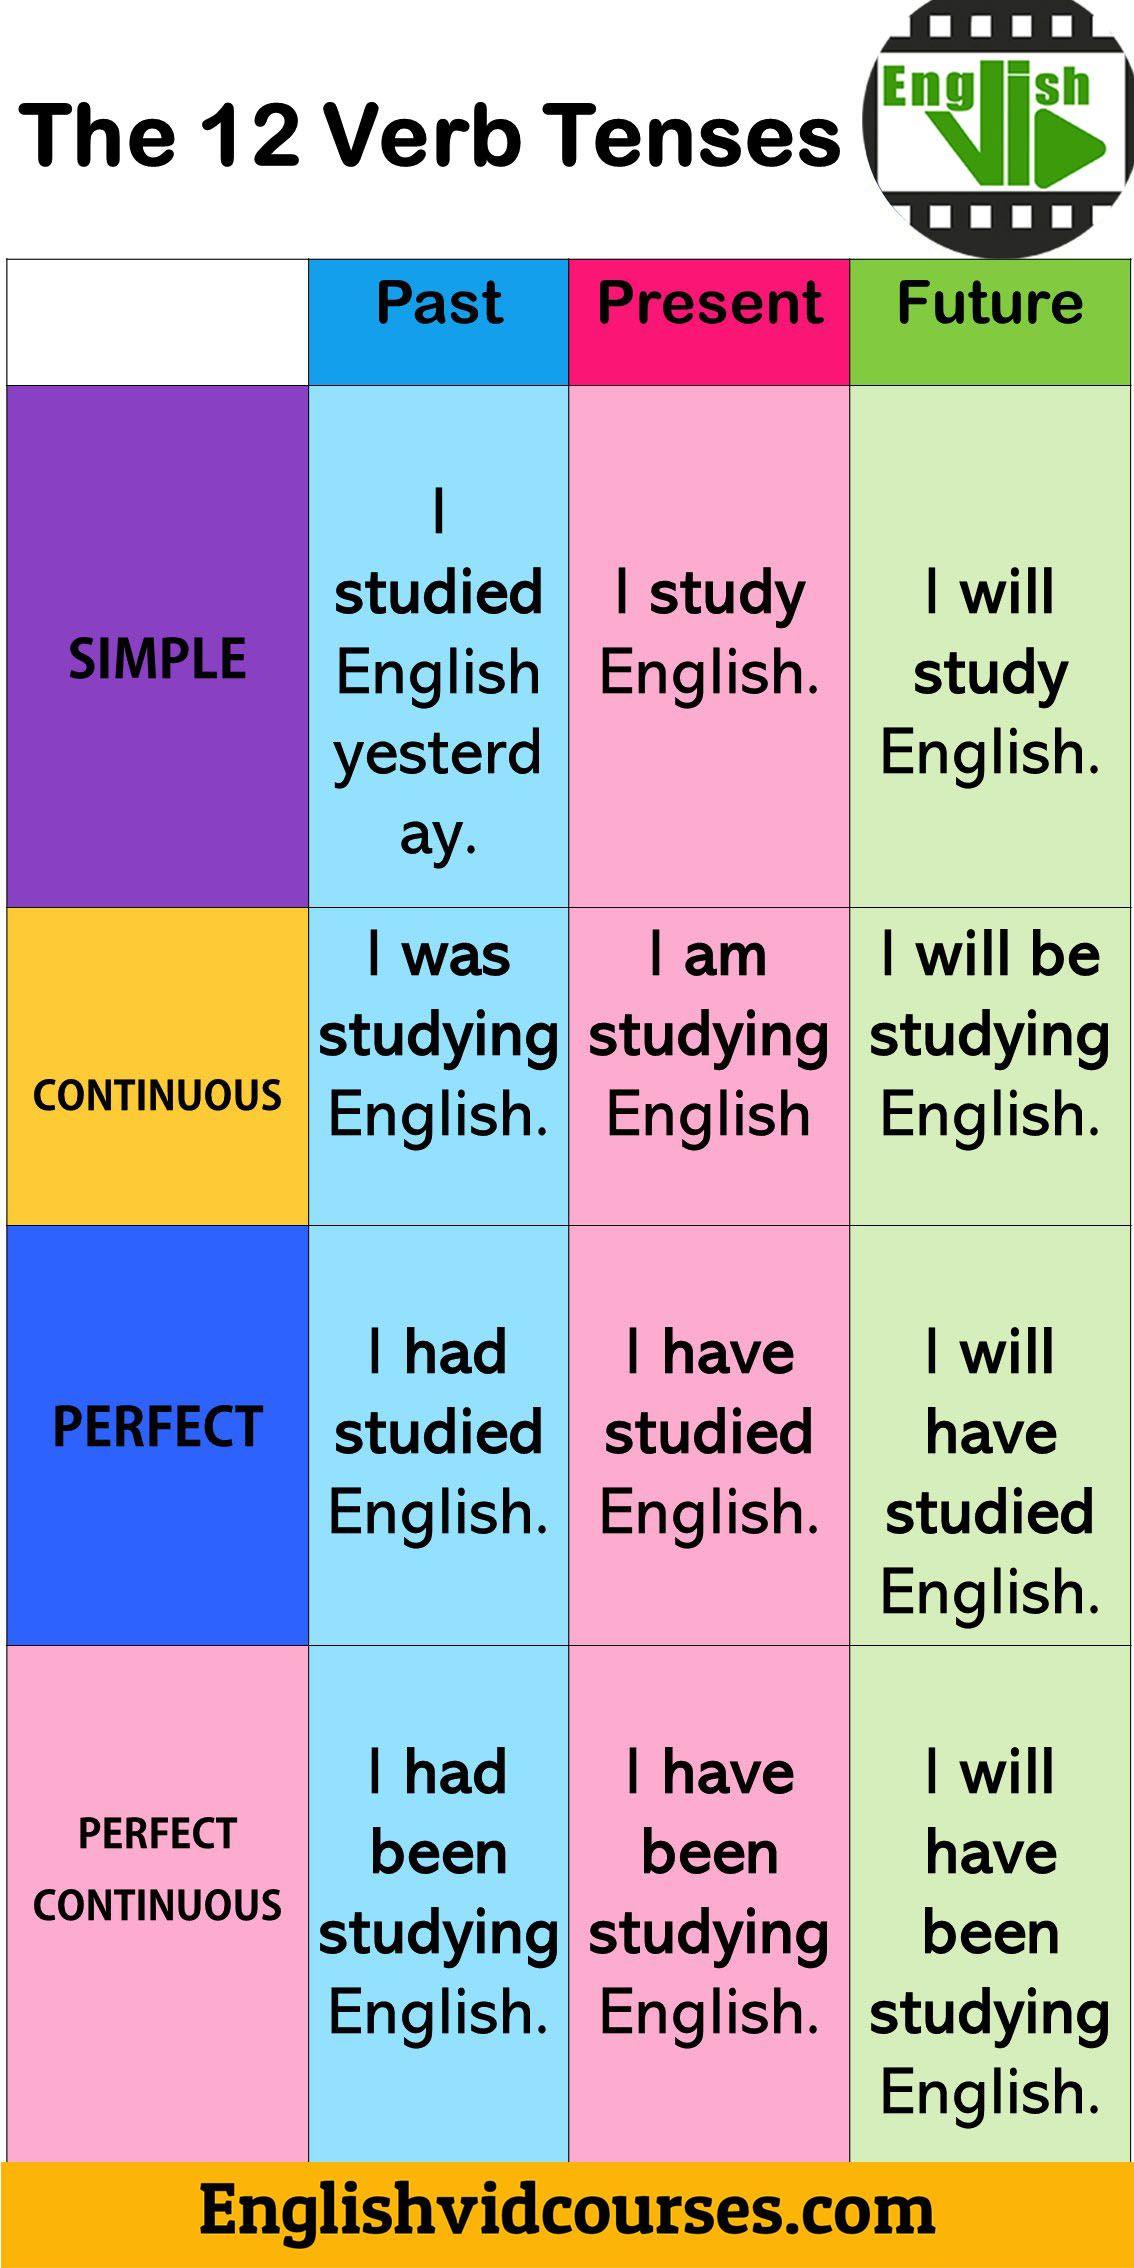 The 12 Verb Tenses In English English Language Learning Grammar Learn English Grammar English Phrases [ 2268 x 1134 Pixel ]